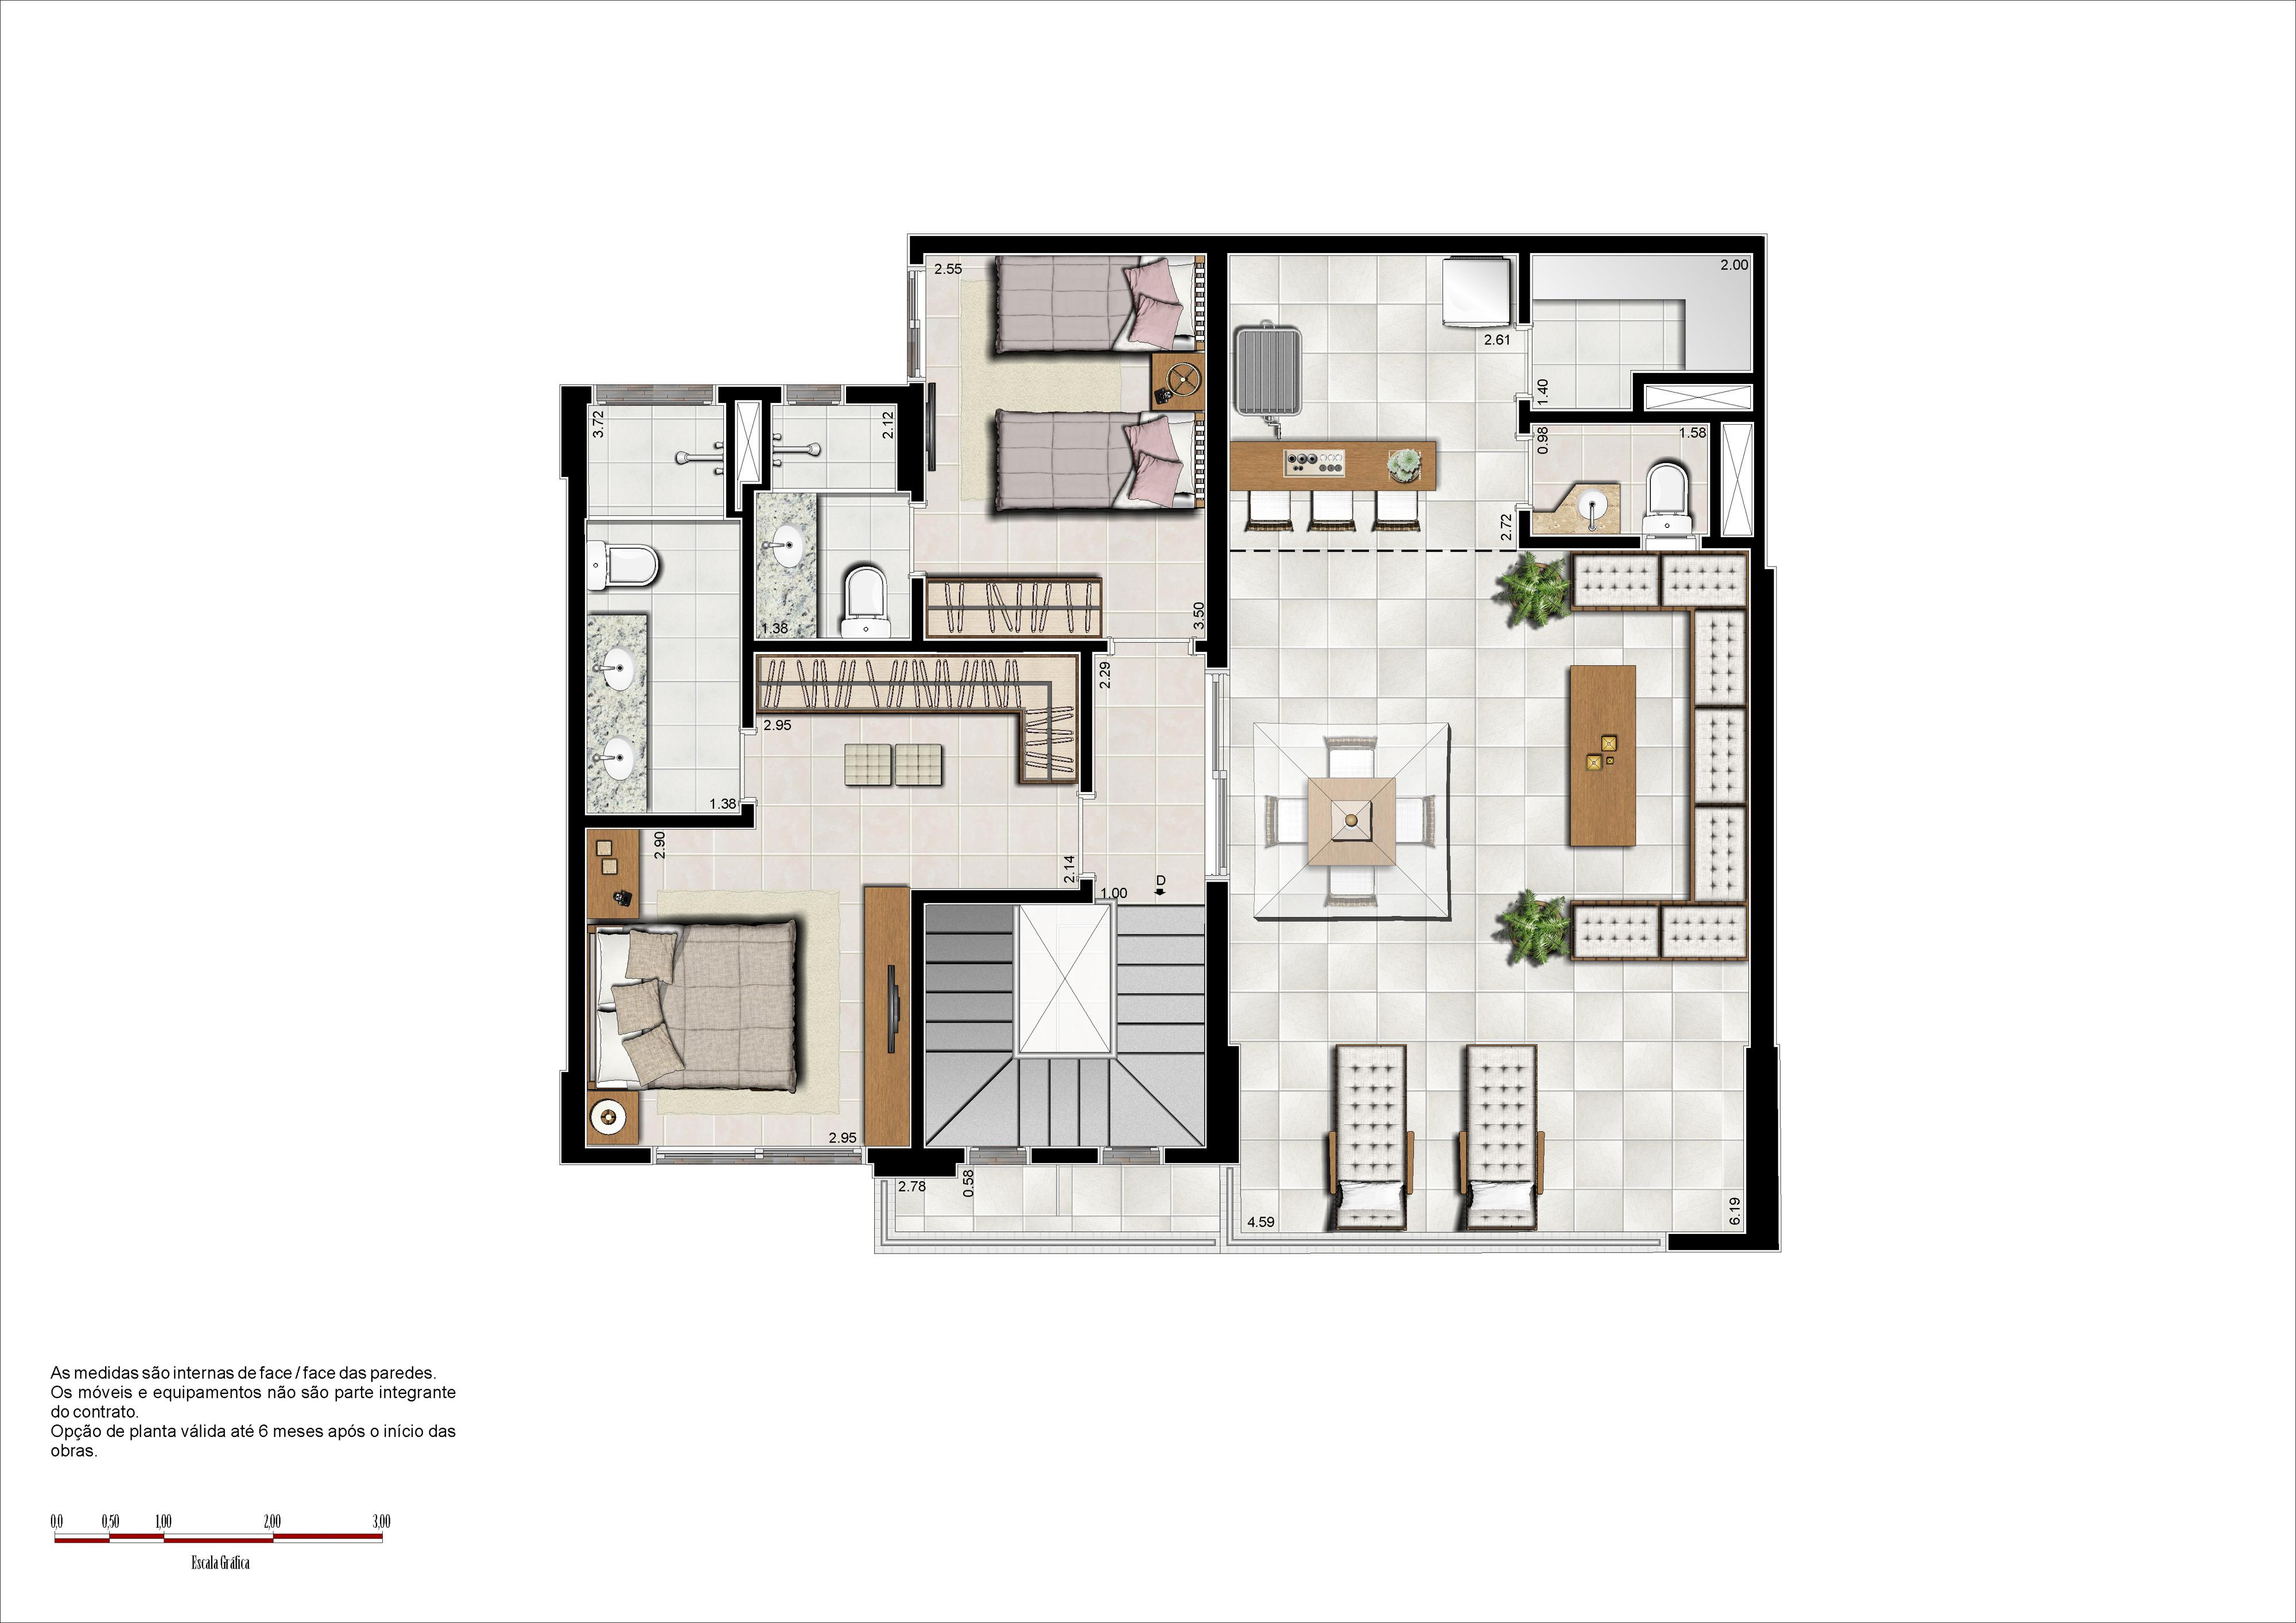 179m² - cobertura superior